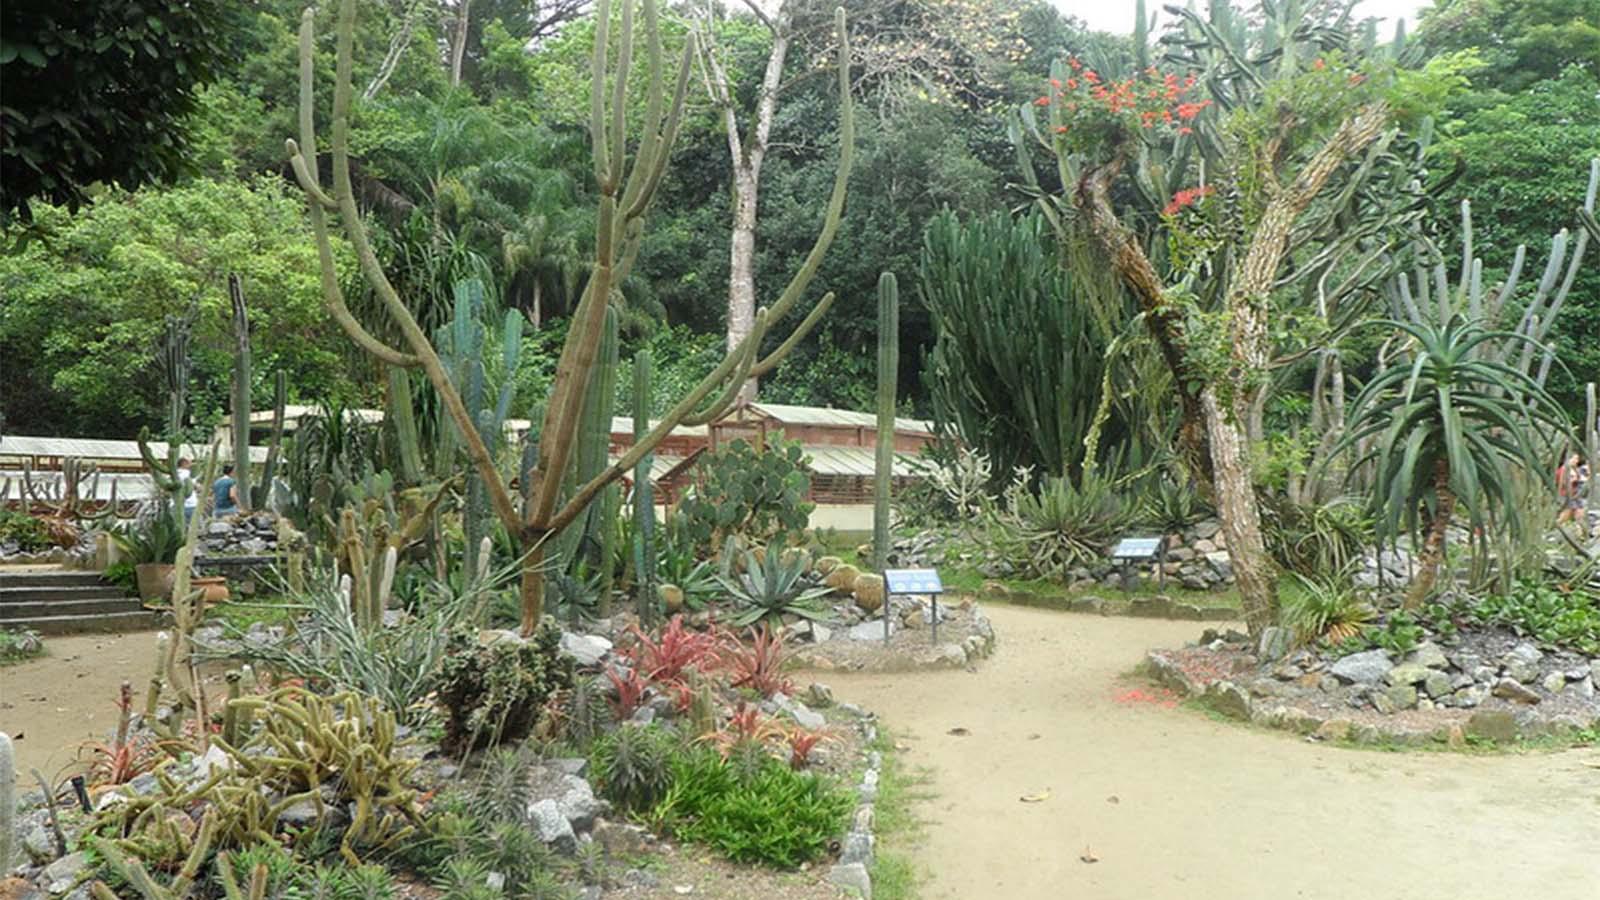 Jardín botánico de Río 2